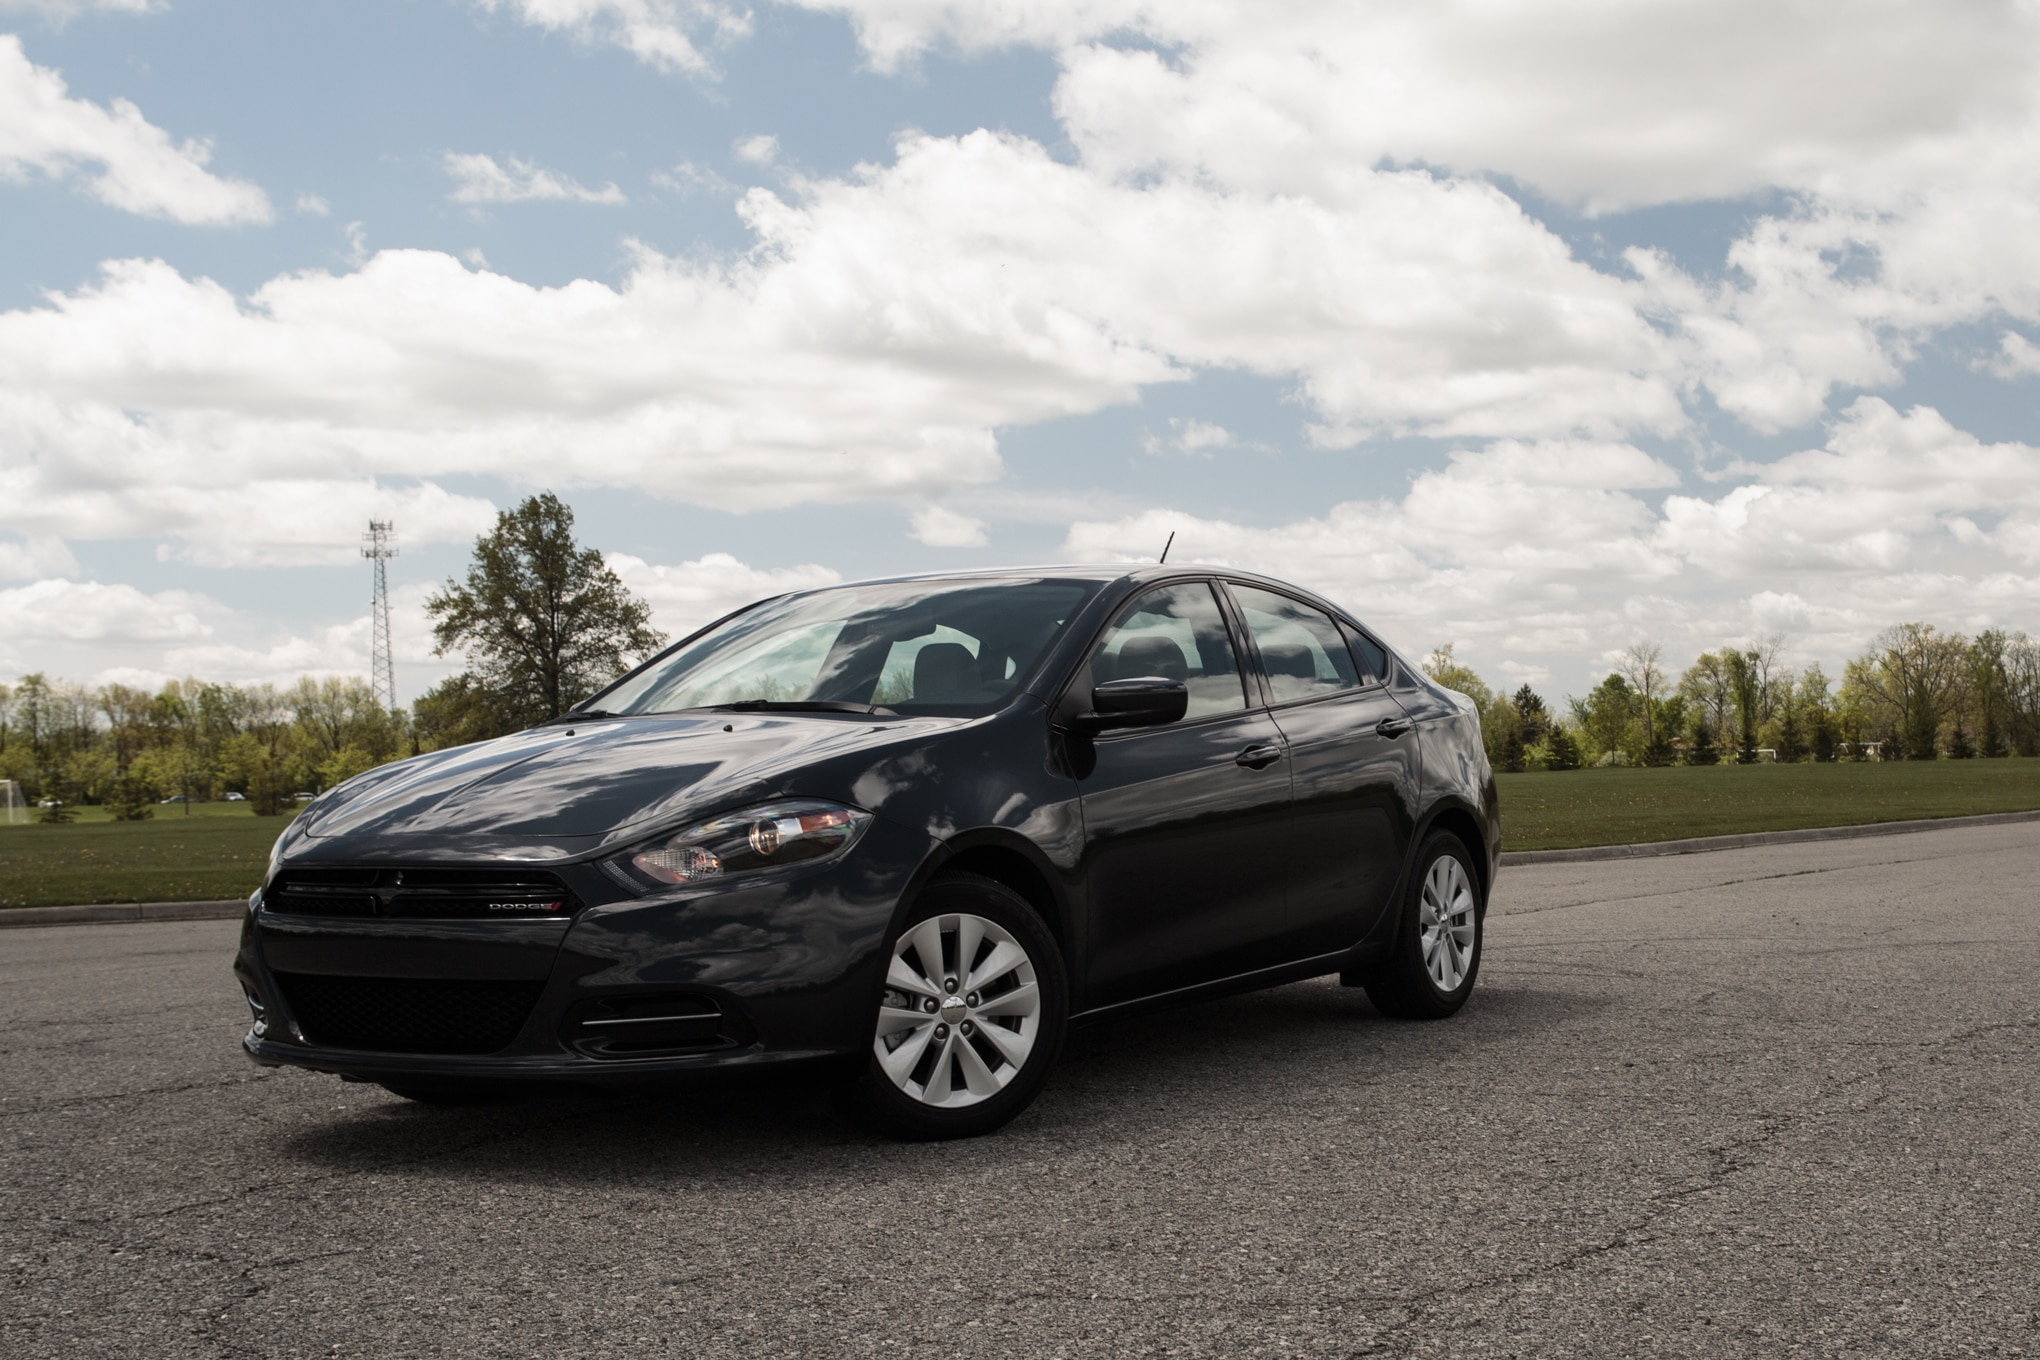 dodge dart tire size 2018 2019 new car reviews by girlcodemovement. Black Bedroom Furniture Sets. Home Design Ideas